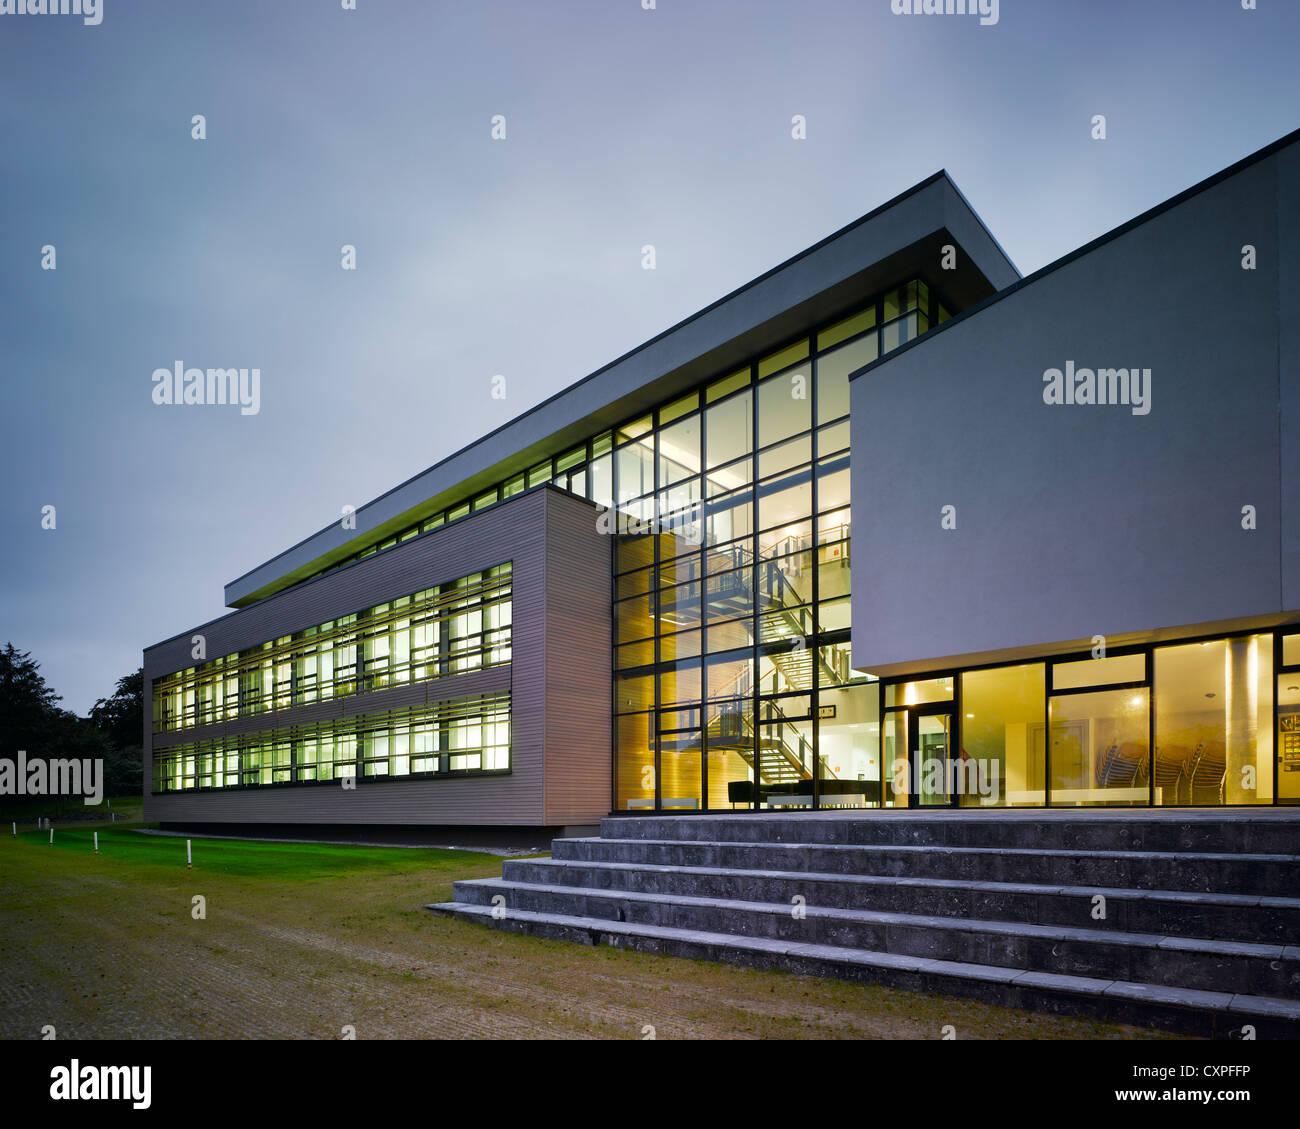 school of nursing, st. angela's college, college, europe, ireland